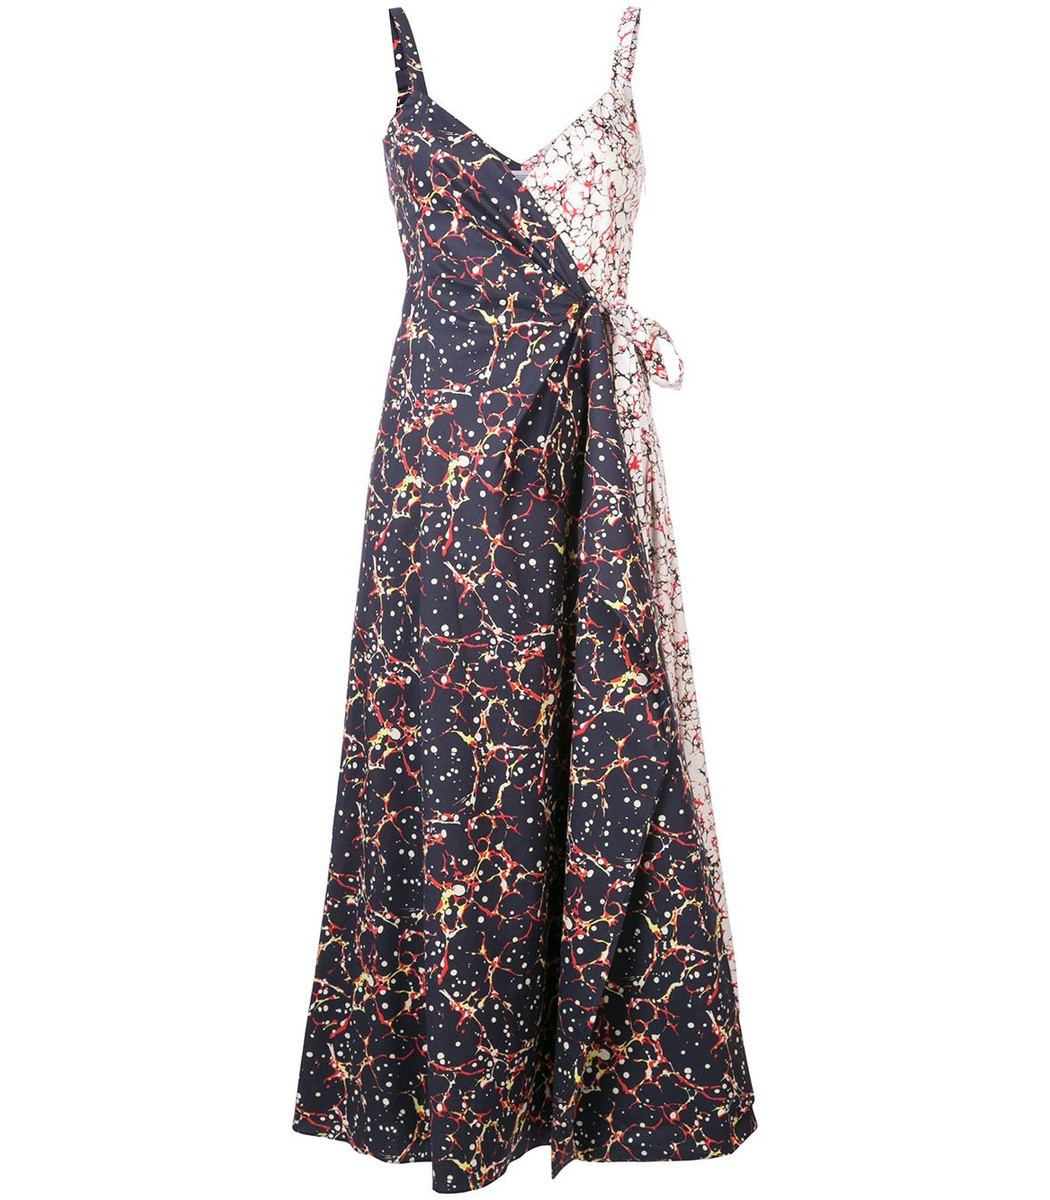 Rosie Assoulin Cottons Khaki That's a Wrap! Dress